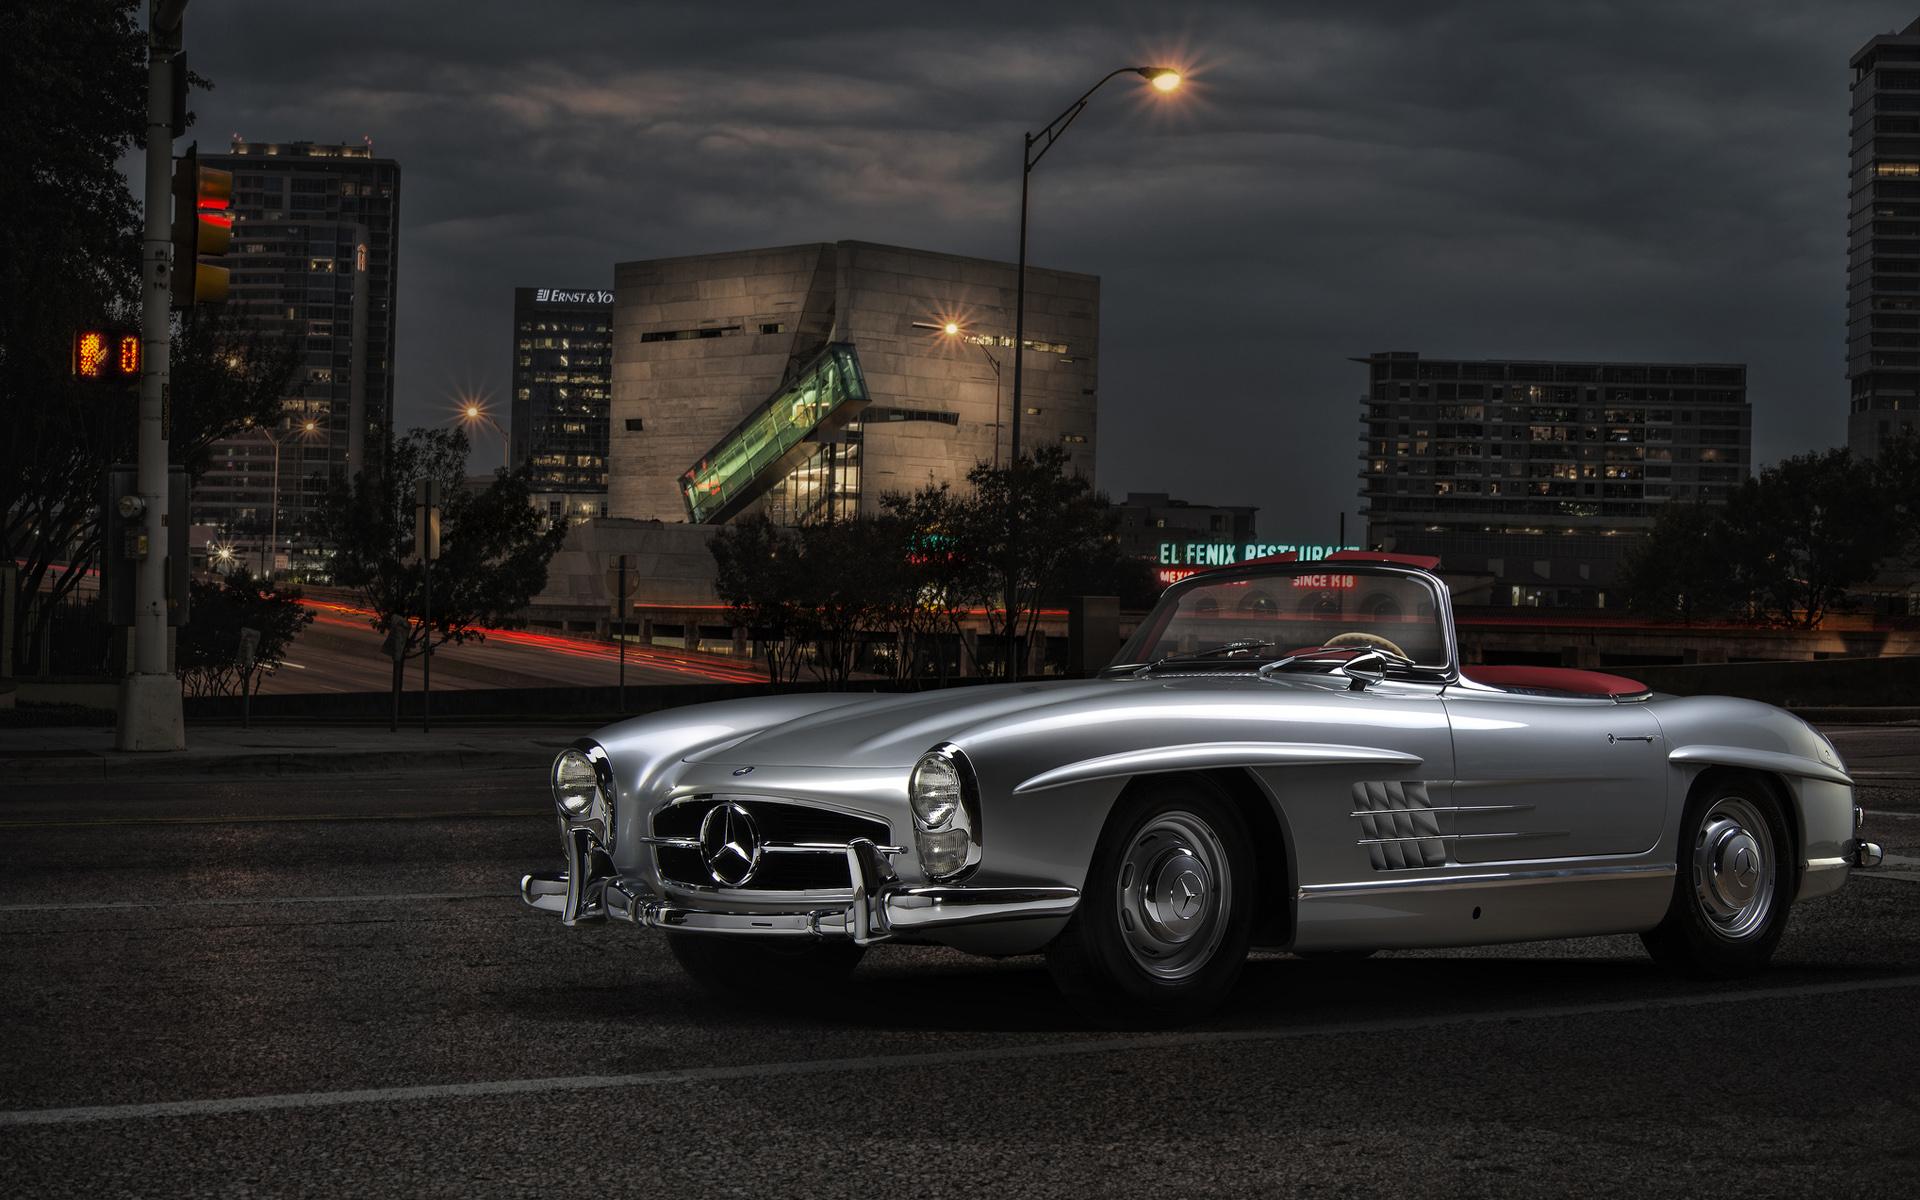 American Muscle Cars Mustang Wallpaper Mercedes Benz Classic Wallpaper Hd Car Wallpapers Id 3382